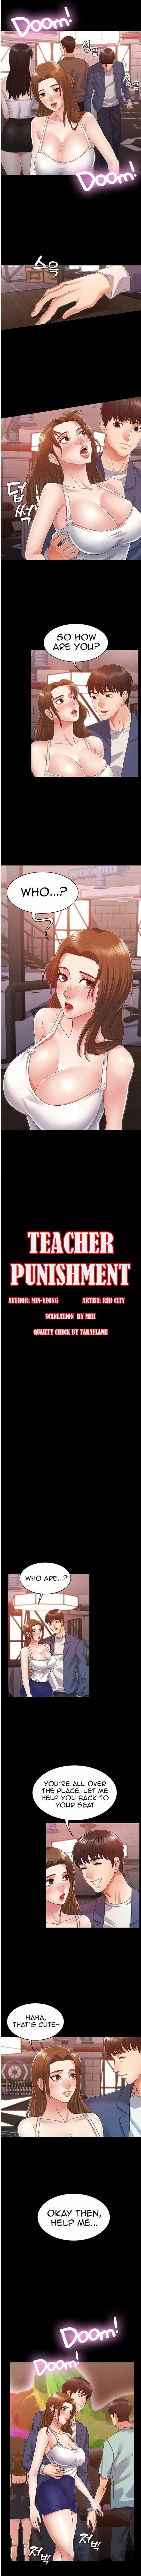 TEACHER PUNISHMENT Ch.1-20 11